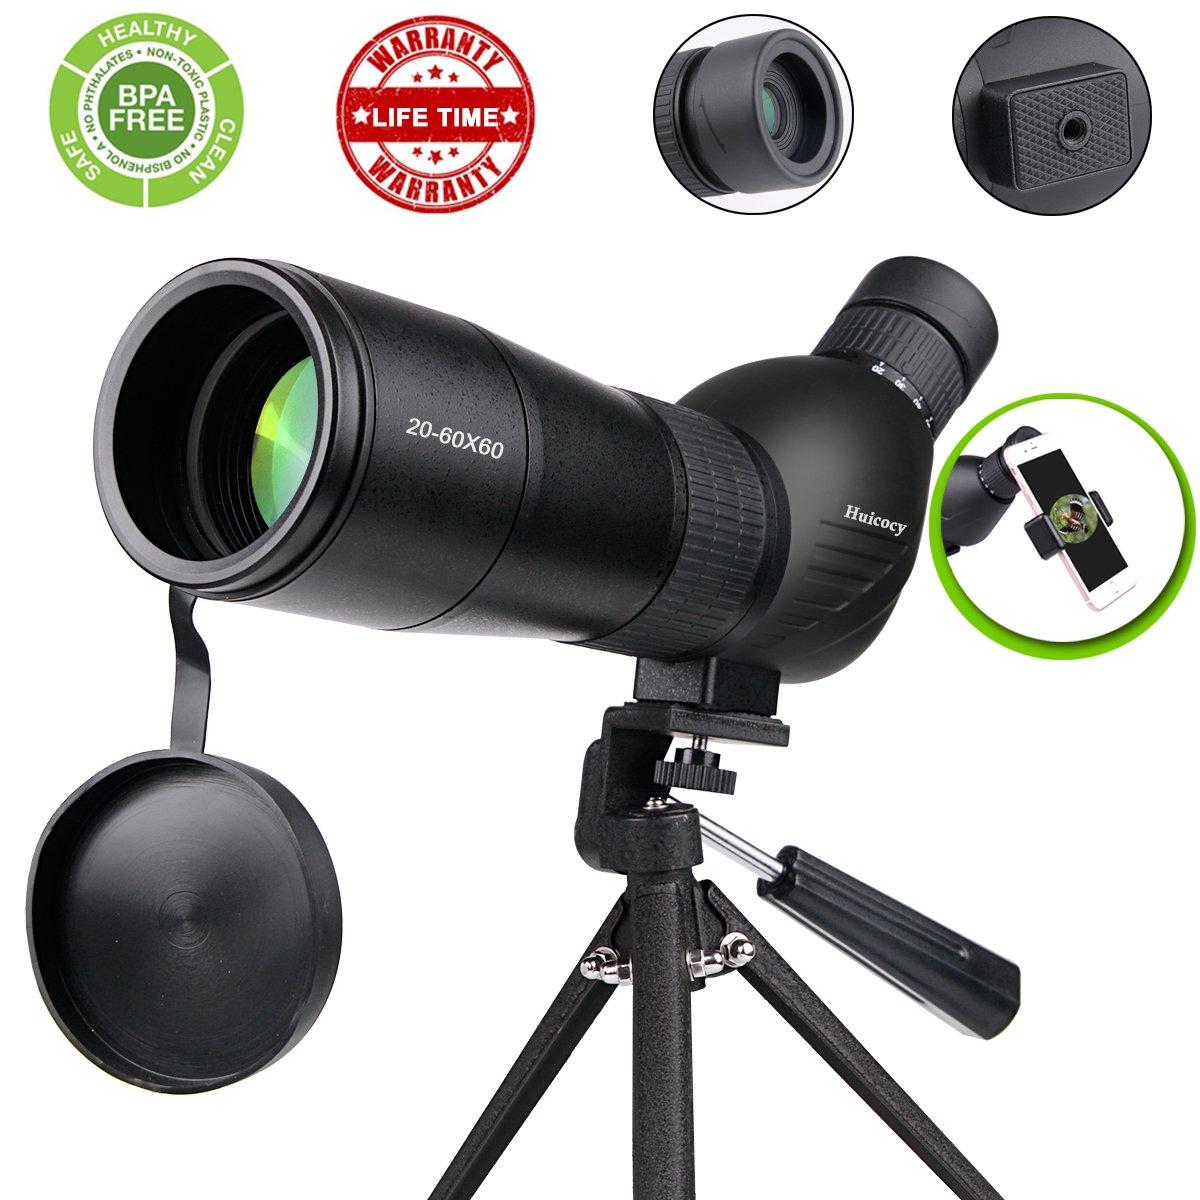 Spotting Scope Huicocy 20 60x60mm Zoom 39 19m 1000m Fully